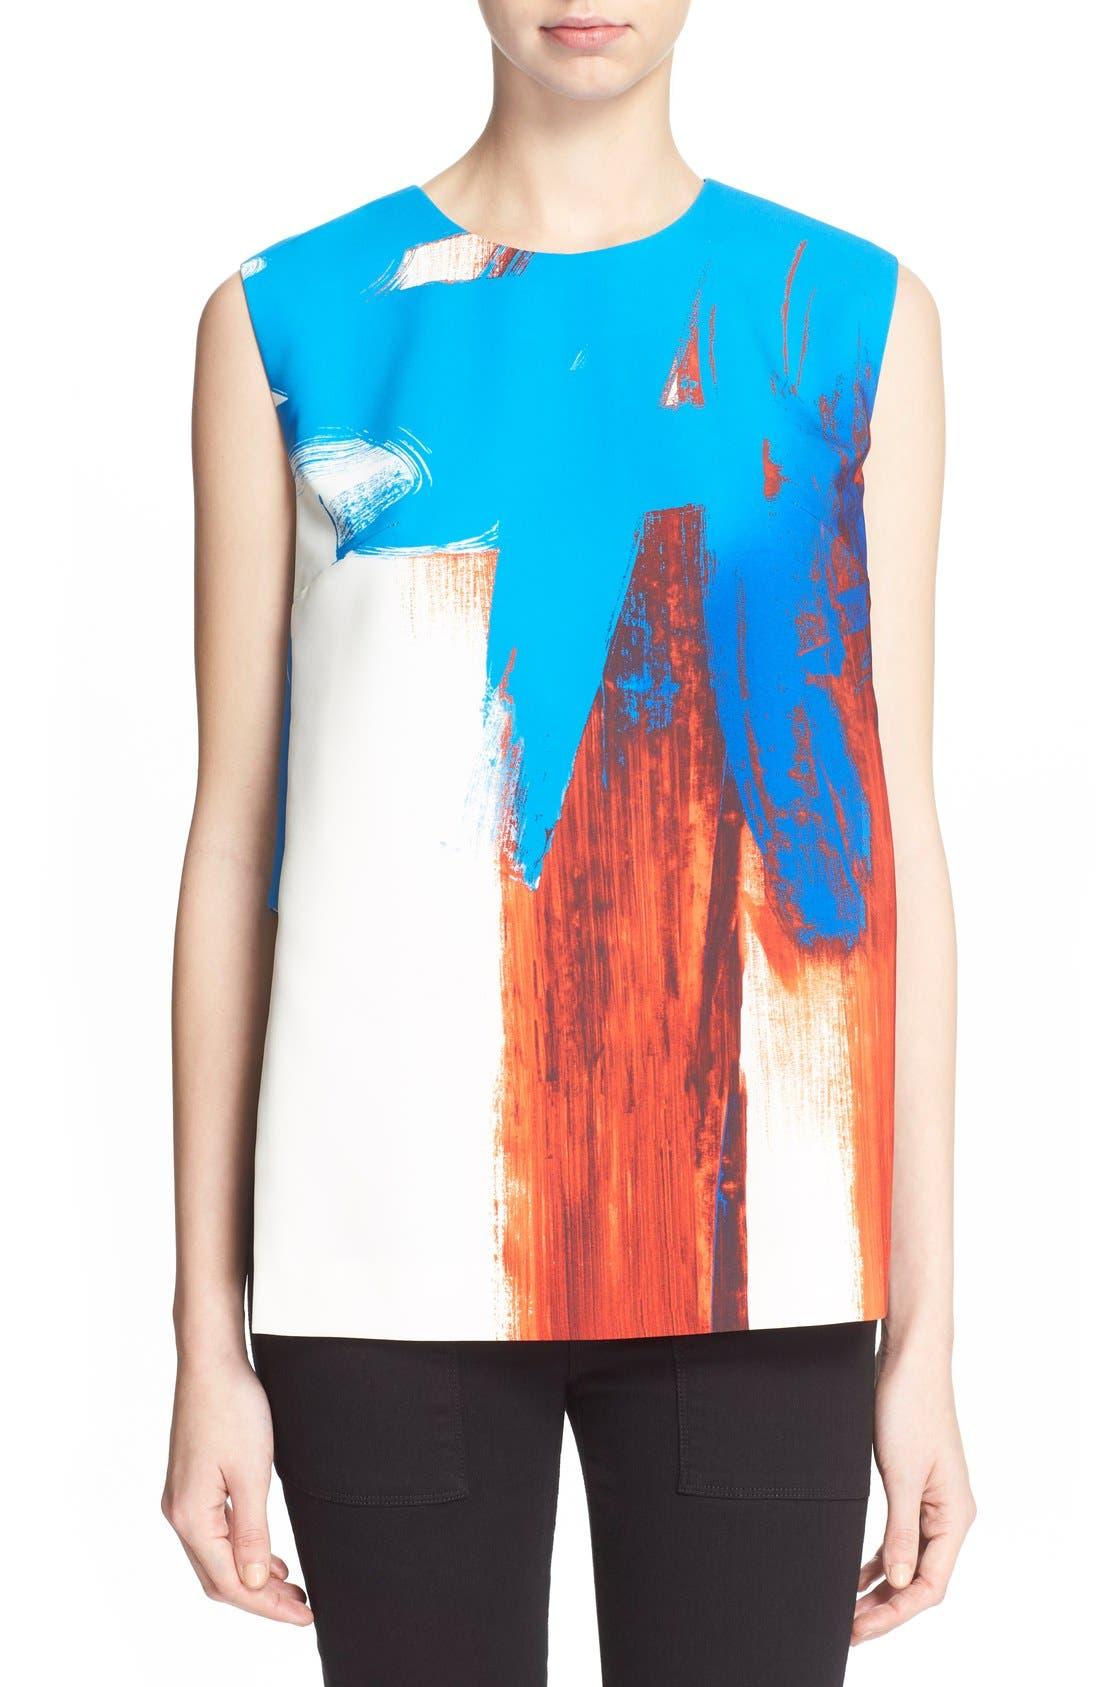 MILLY Brushstroke Print Sleeveless Top, Main, color, 005